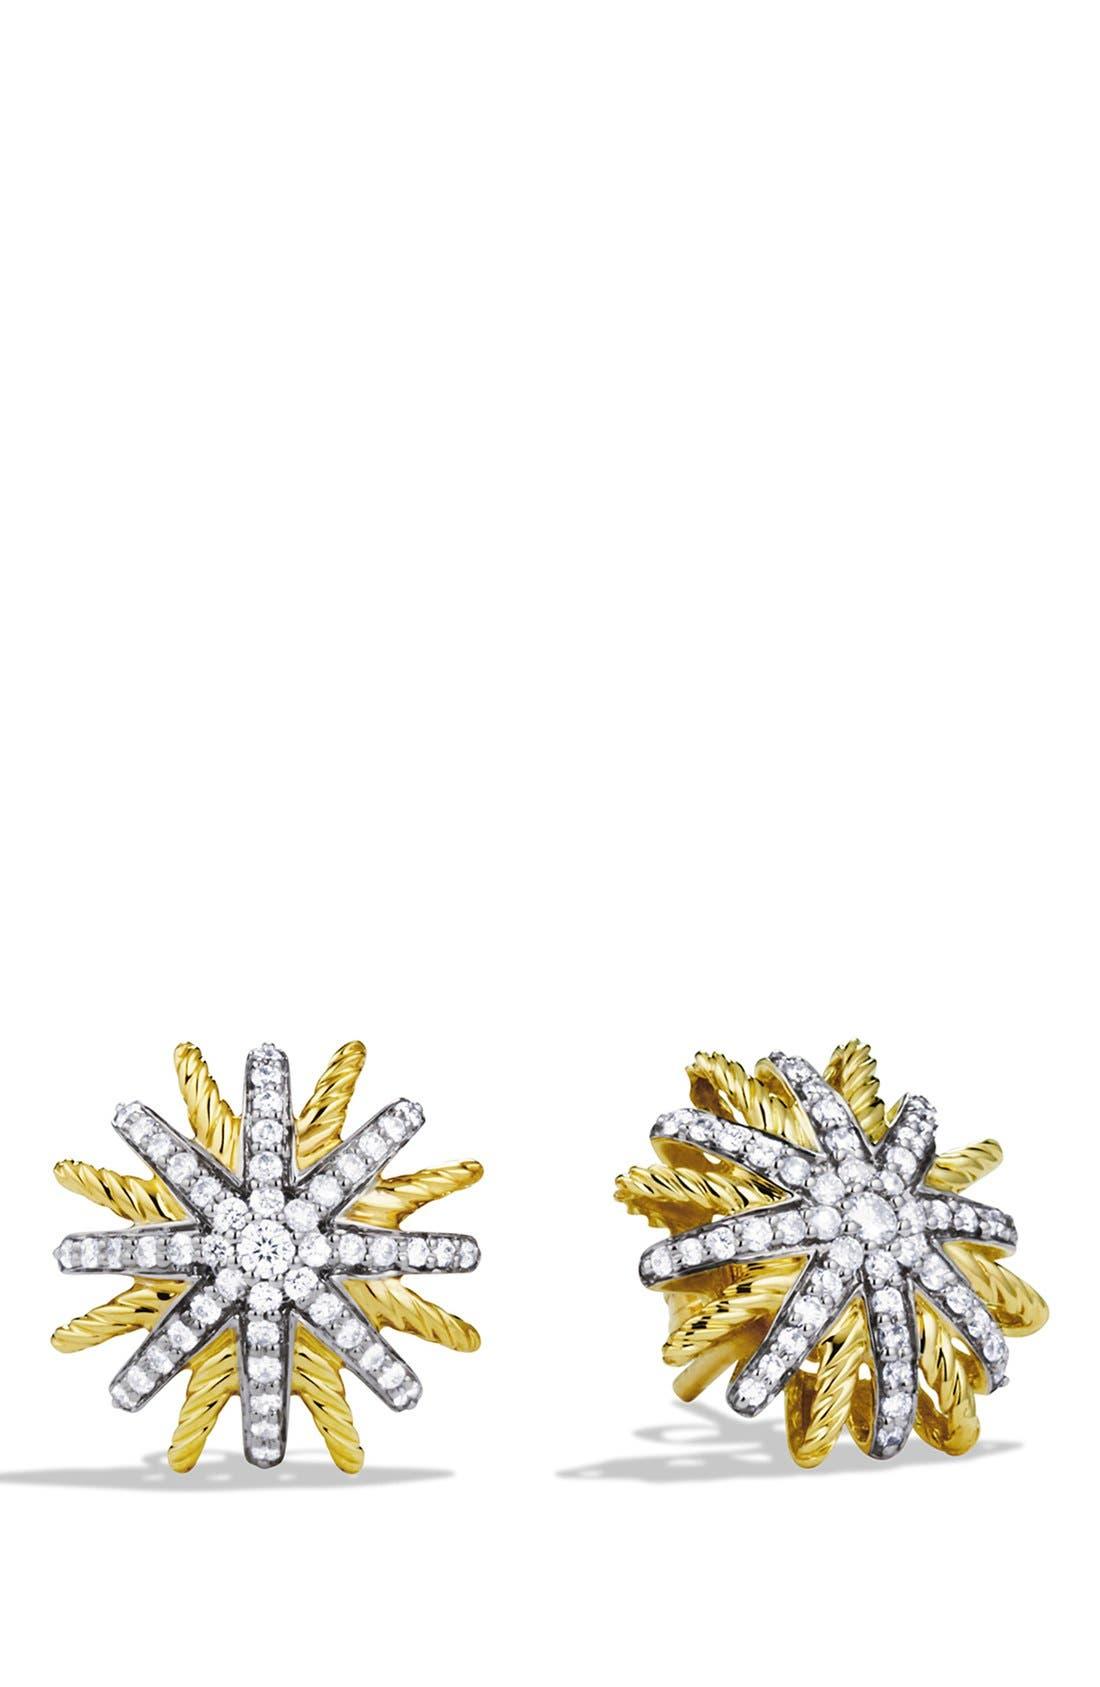 Main Image - David Yurman 'Starburst' Extra-Small Earrings with Diamonds in Gold